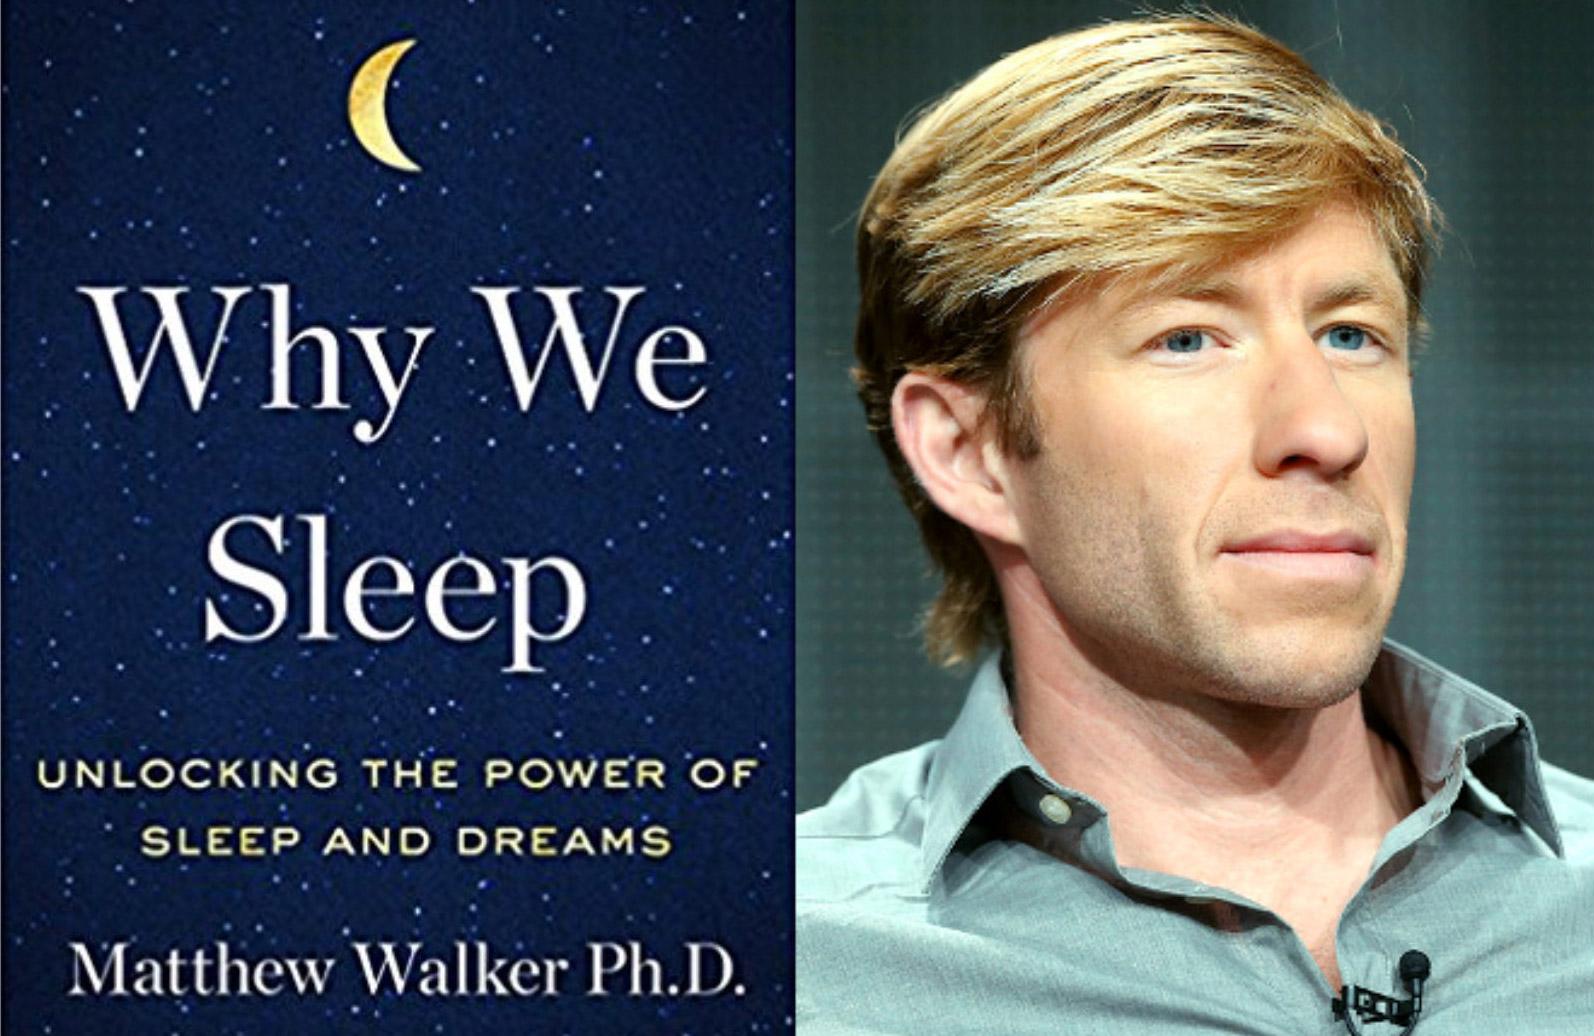 matthew-walker-why-we-sleep.jpg